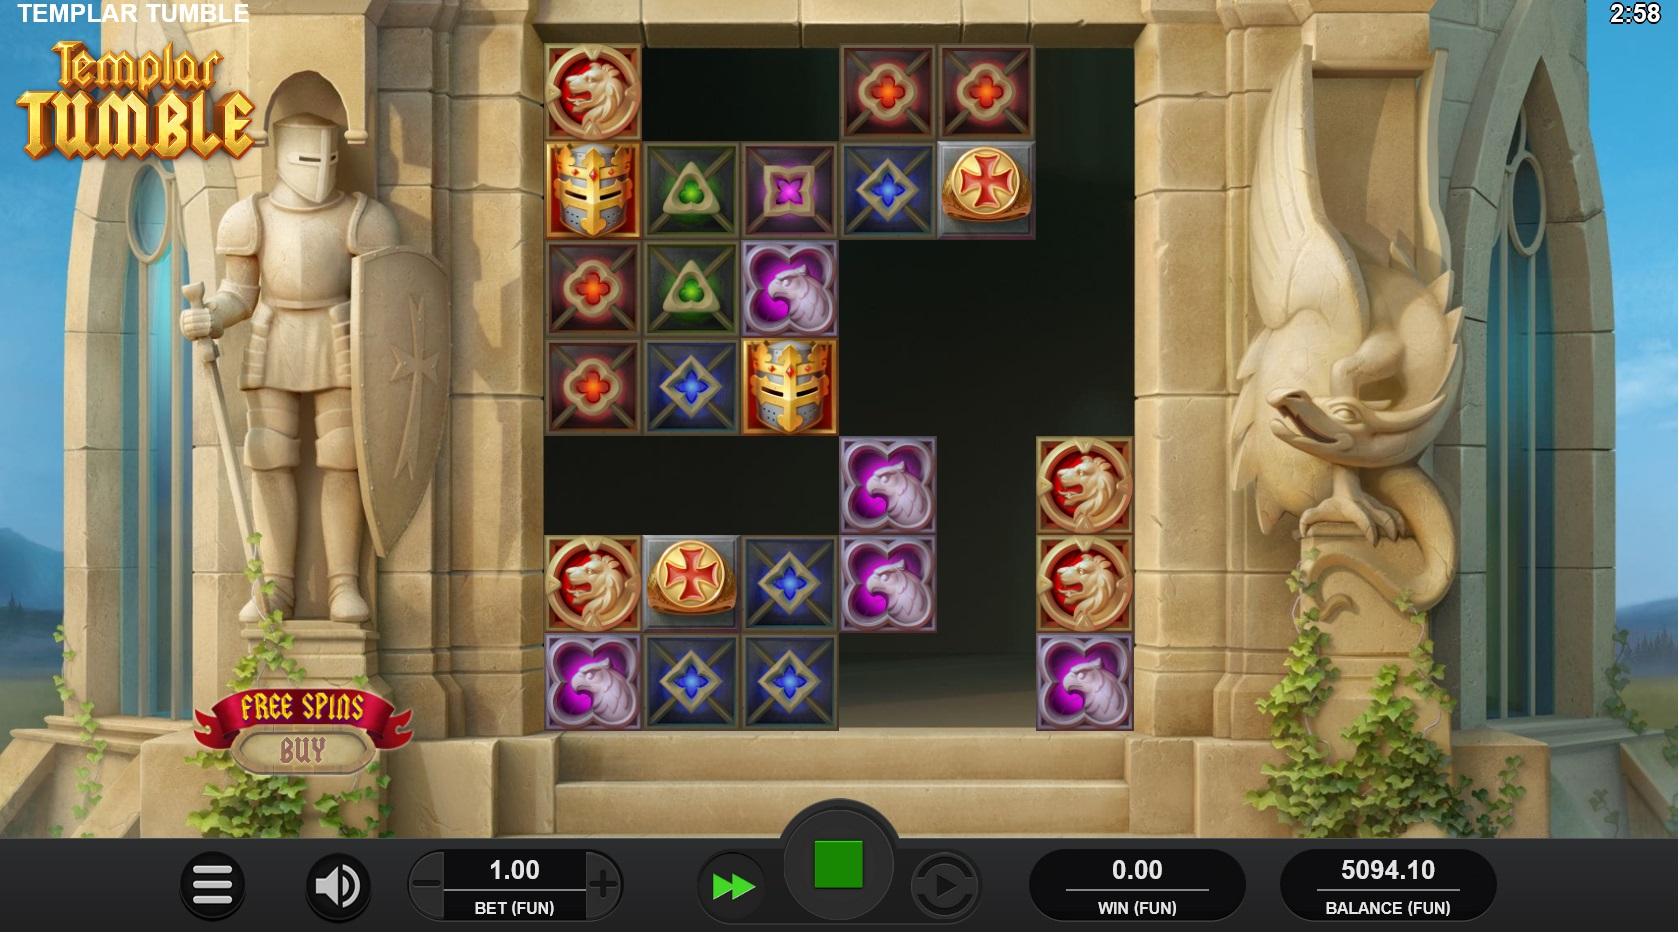 Templar Tumble trigger free spins